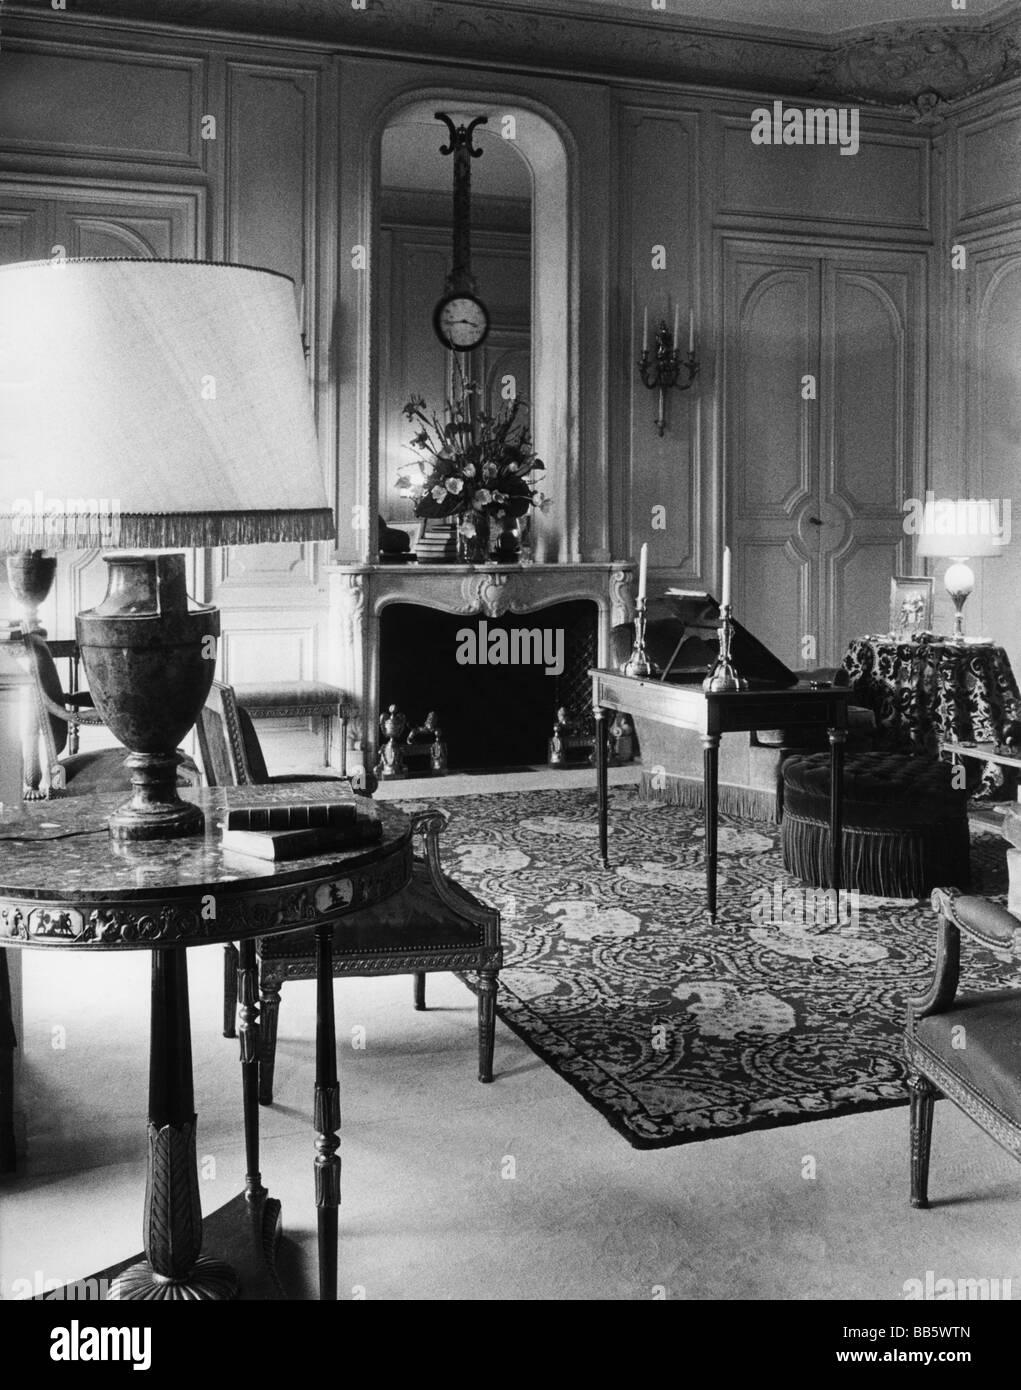 Le Design Interieur Annees 1950 Coiffure Jeux Additional Rights